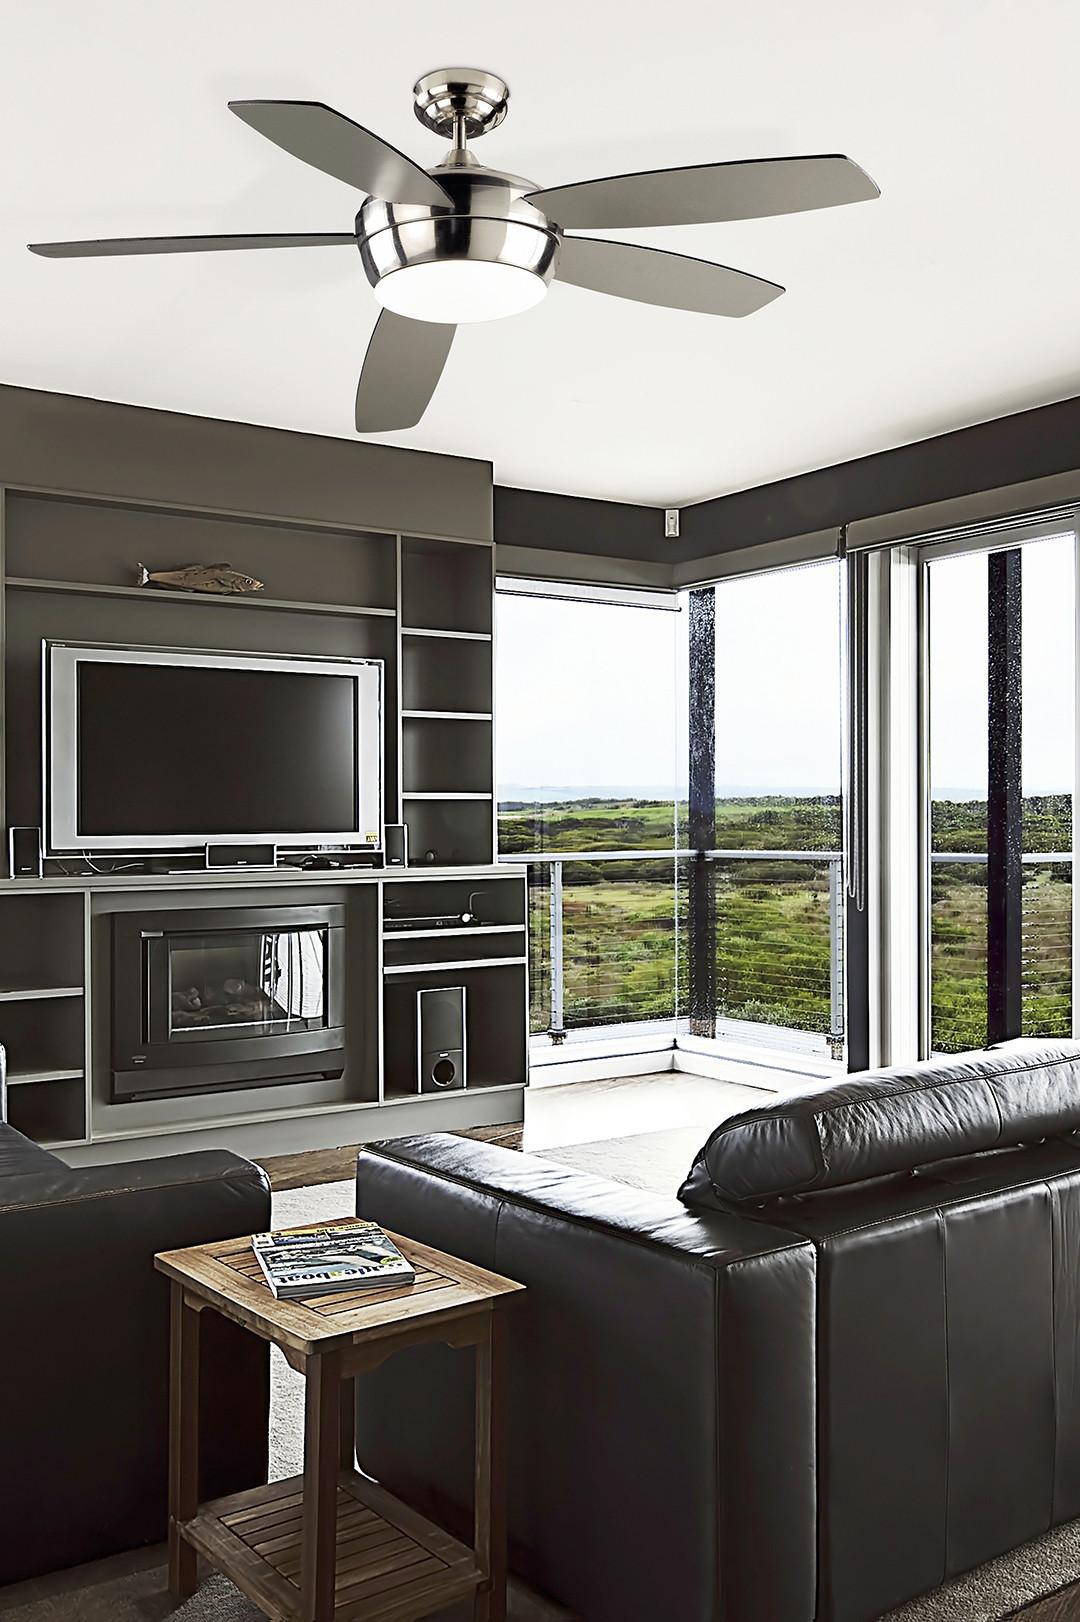 ventilateur de plafond lumineux 3 vitesses gamme samal. Black Bedroom Furniture Sets. Home Design Ideas